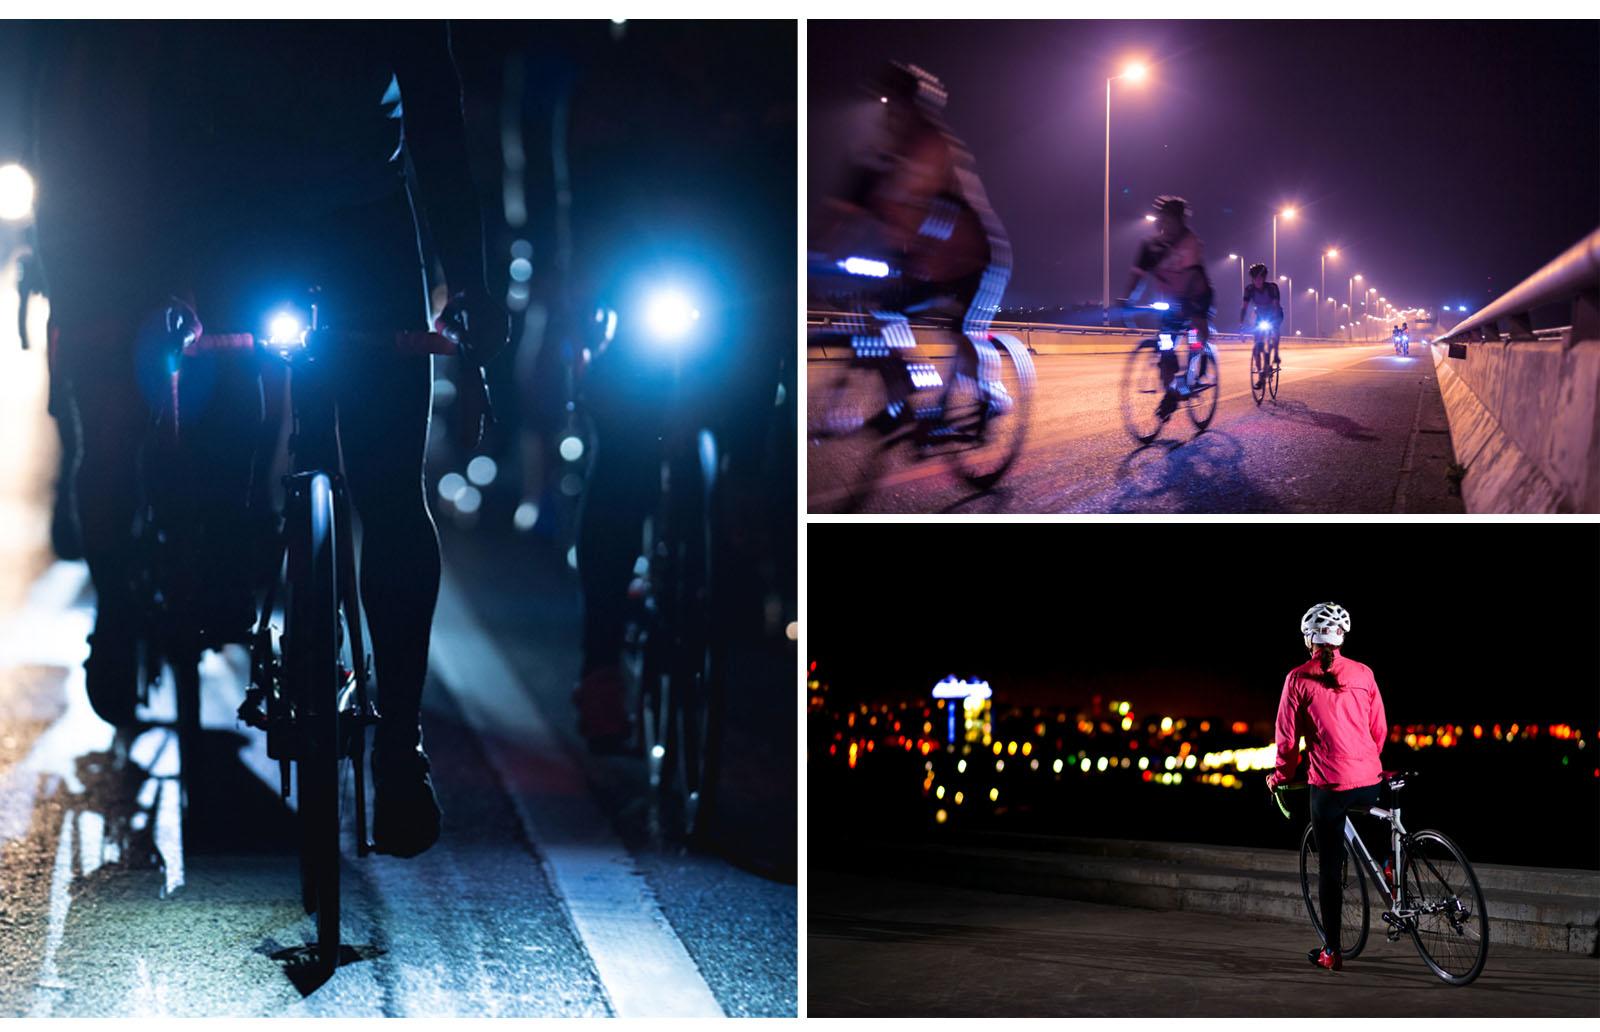 night bike rides